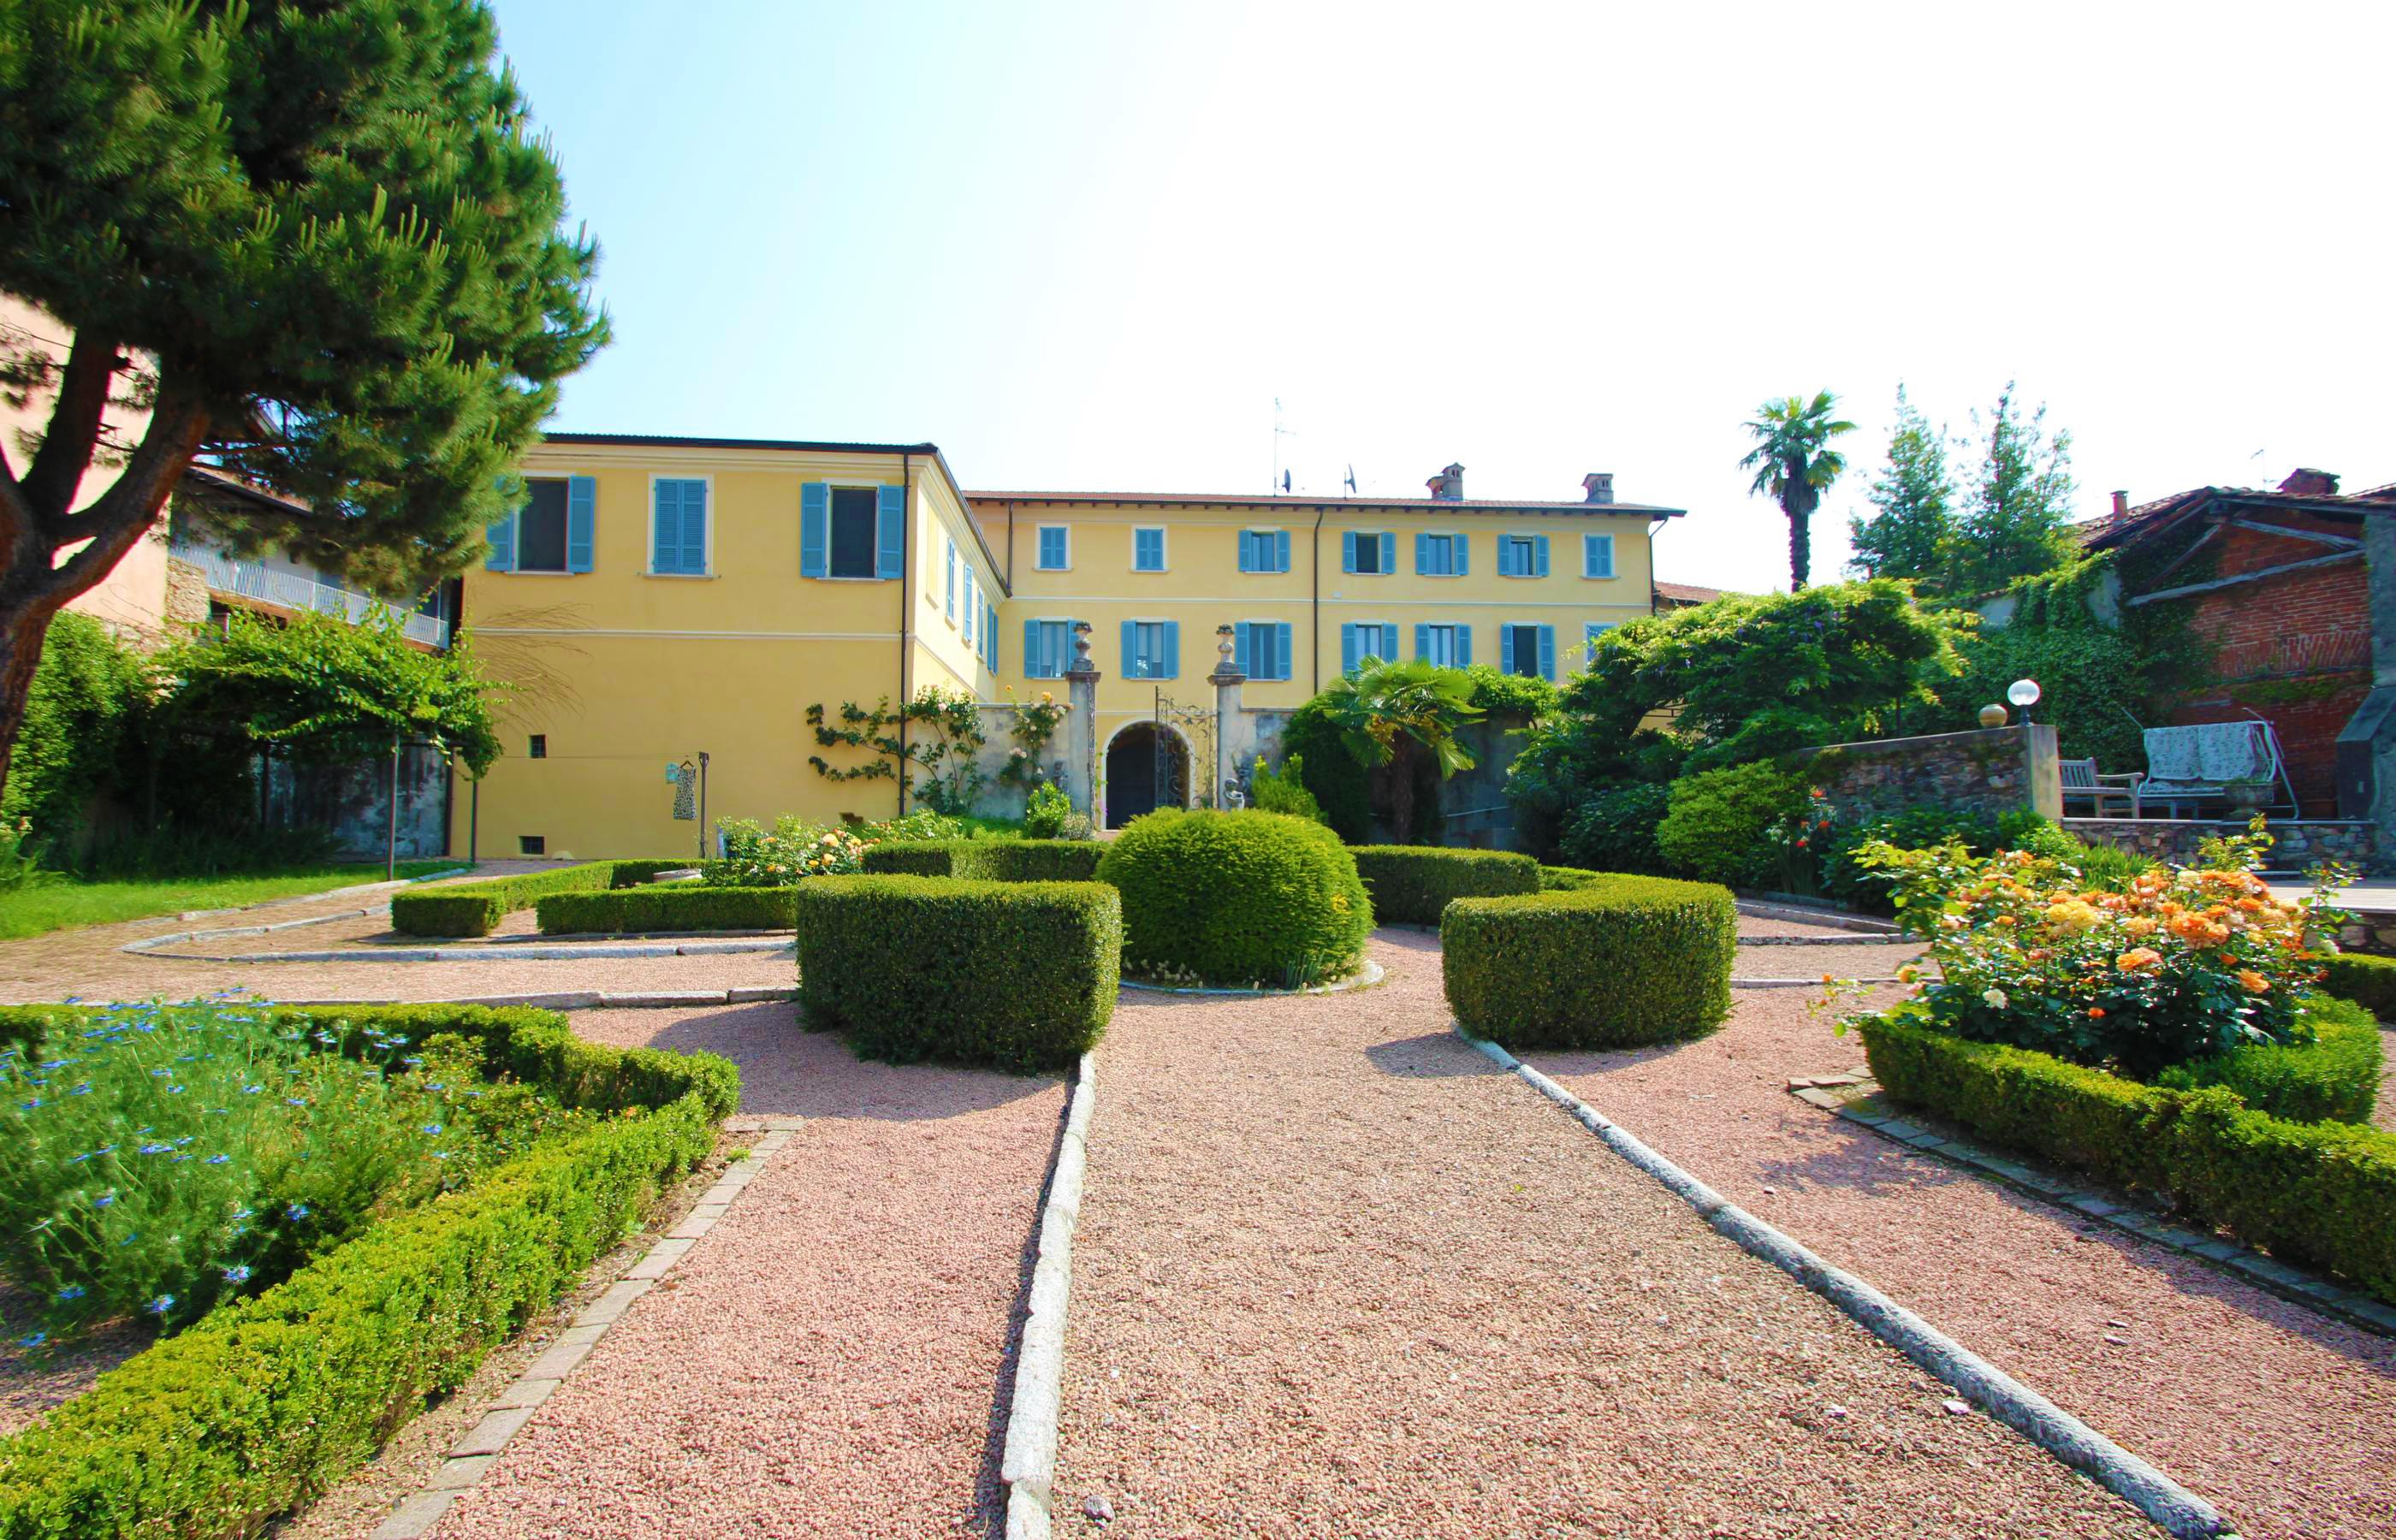 AUZATE Splendida villa con parco e piscina